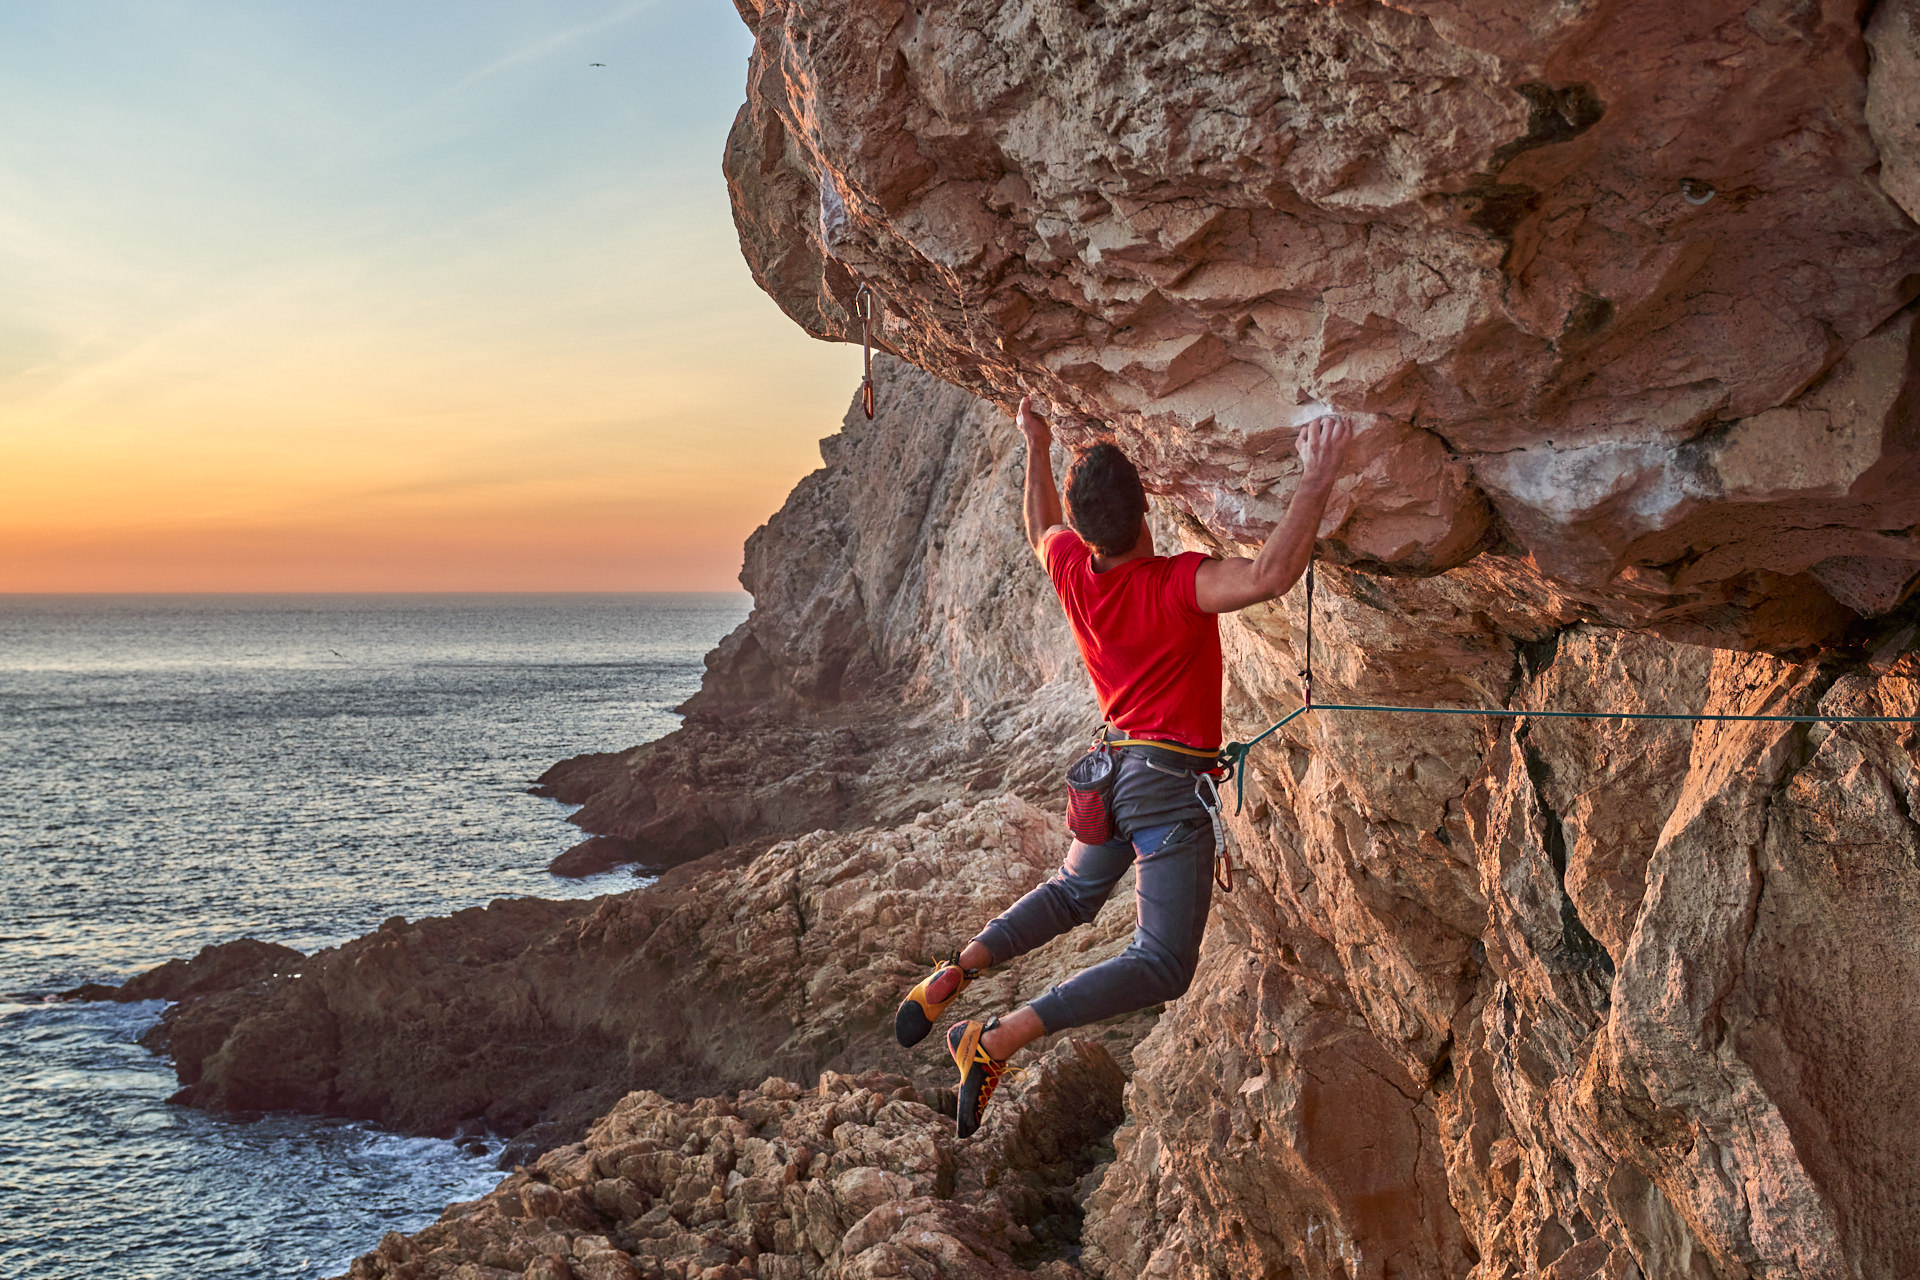 Lisbon Climbing Guide - Tiago Martins climbing La Traviata (8a) in Atlântida ©Martim Vidigal